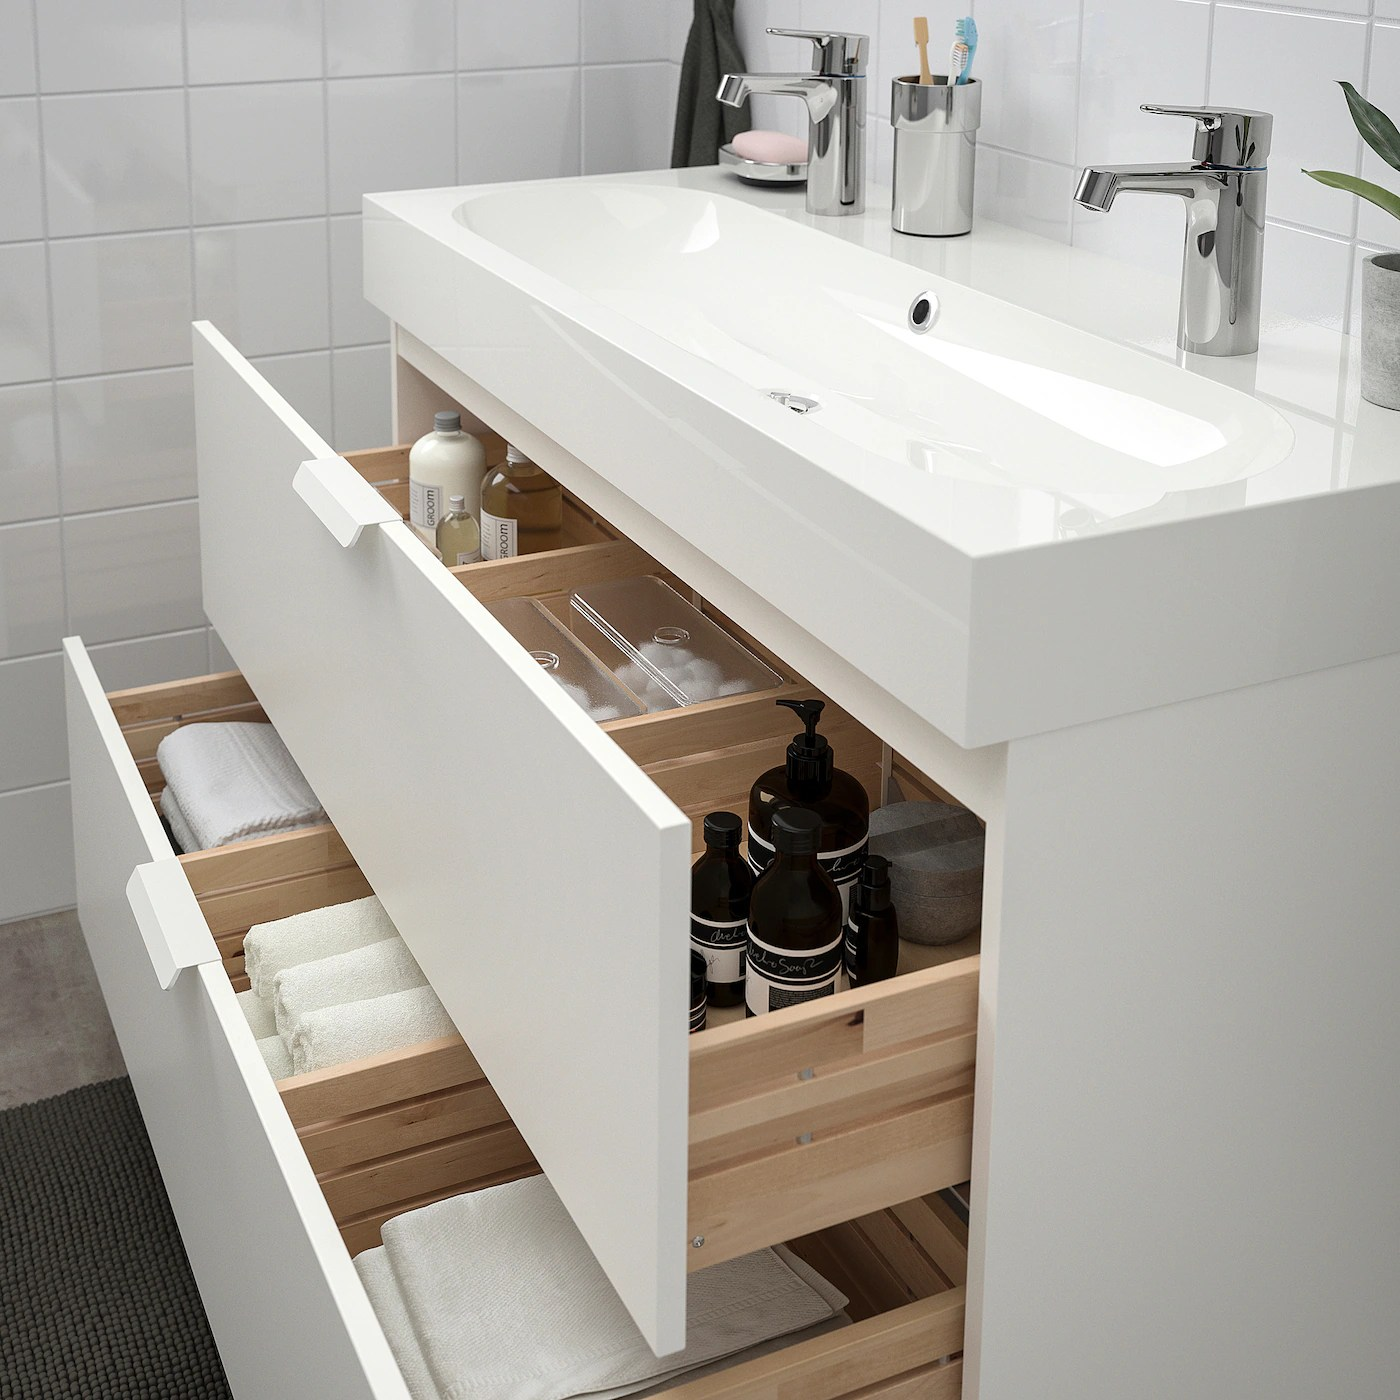 Godmorgon Braviken Meuble Lavabo 2tir Blanc Mitigeur Lavabo Brogrund 100x48x68 Cm Ikea